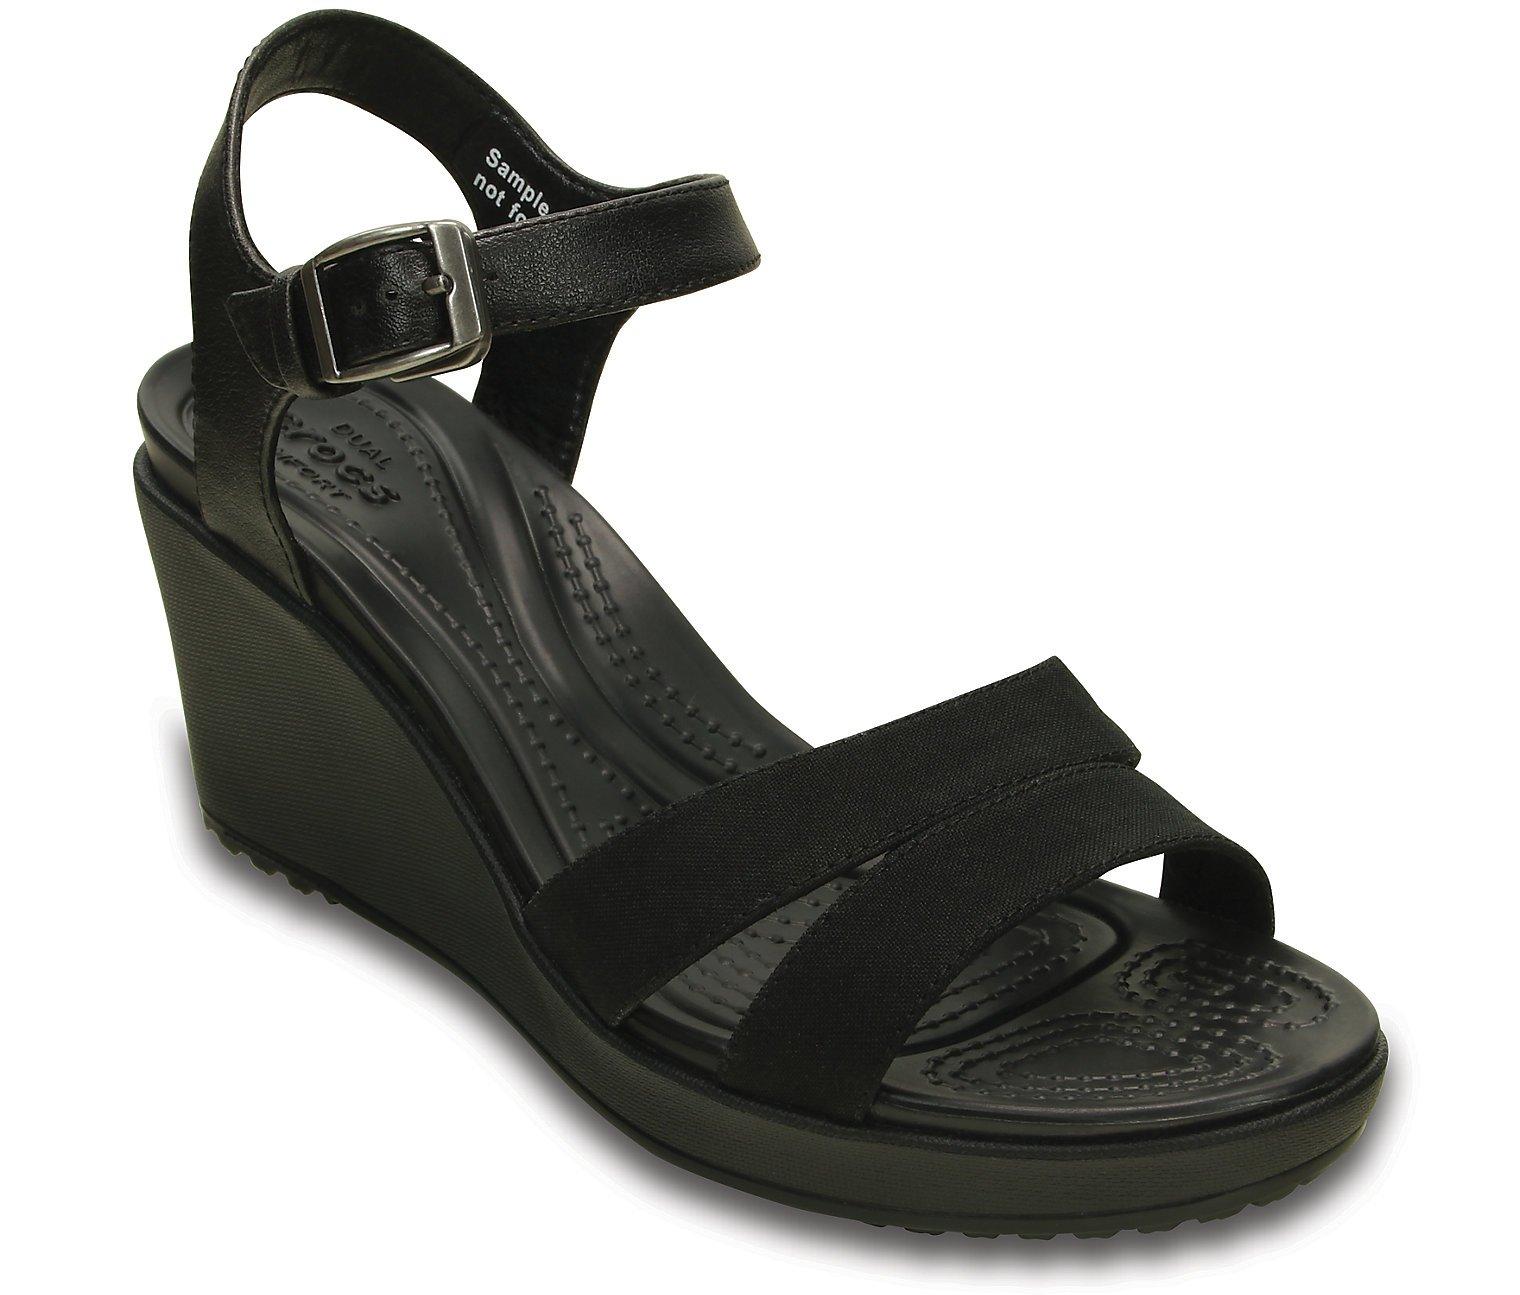 Crocs Women's Leigh II Ankle Strap Wedge, Black/Black, 10 M US